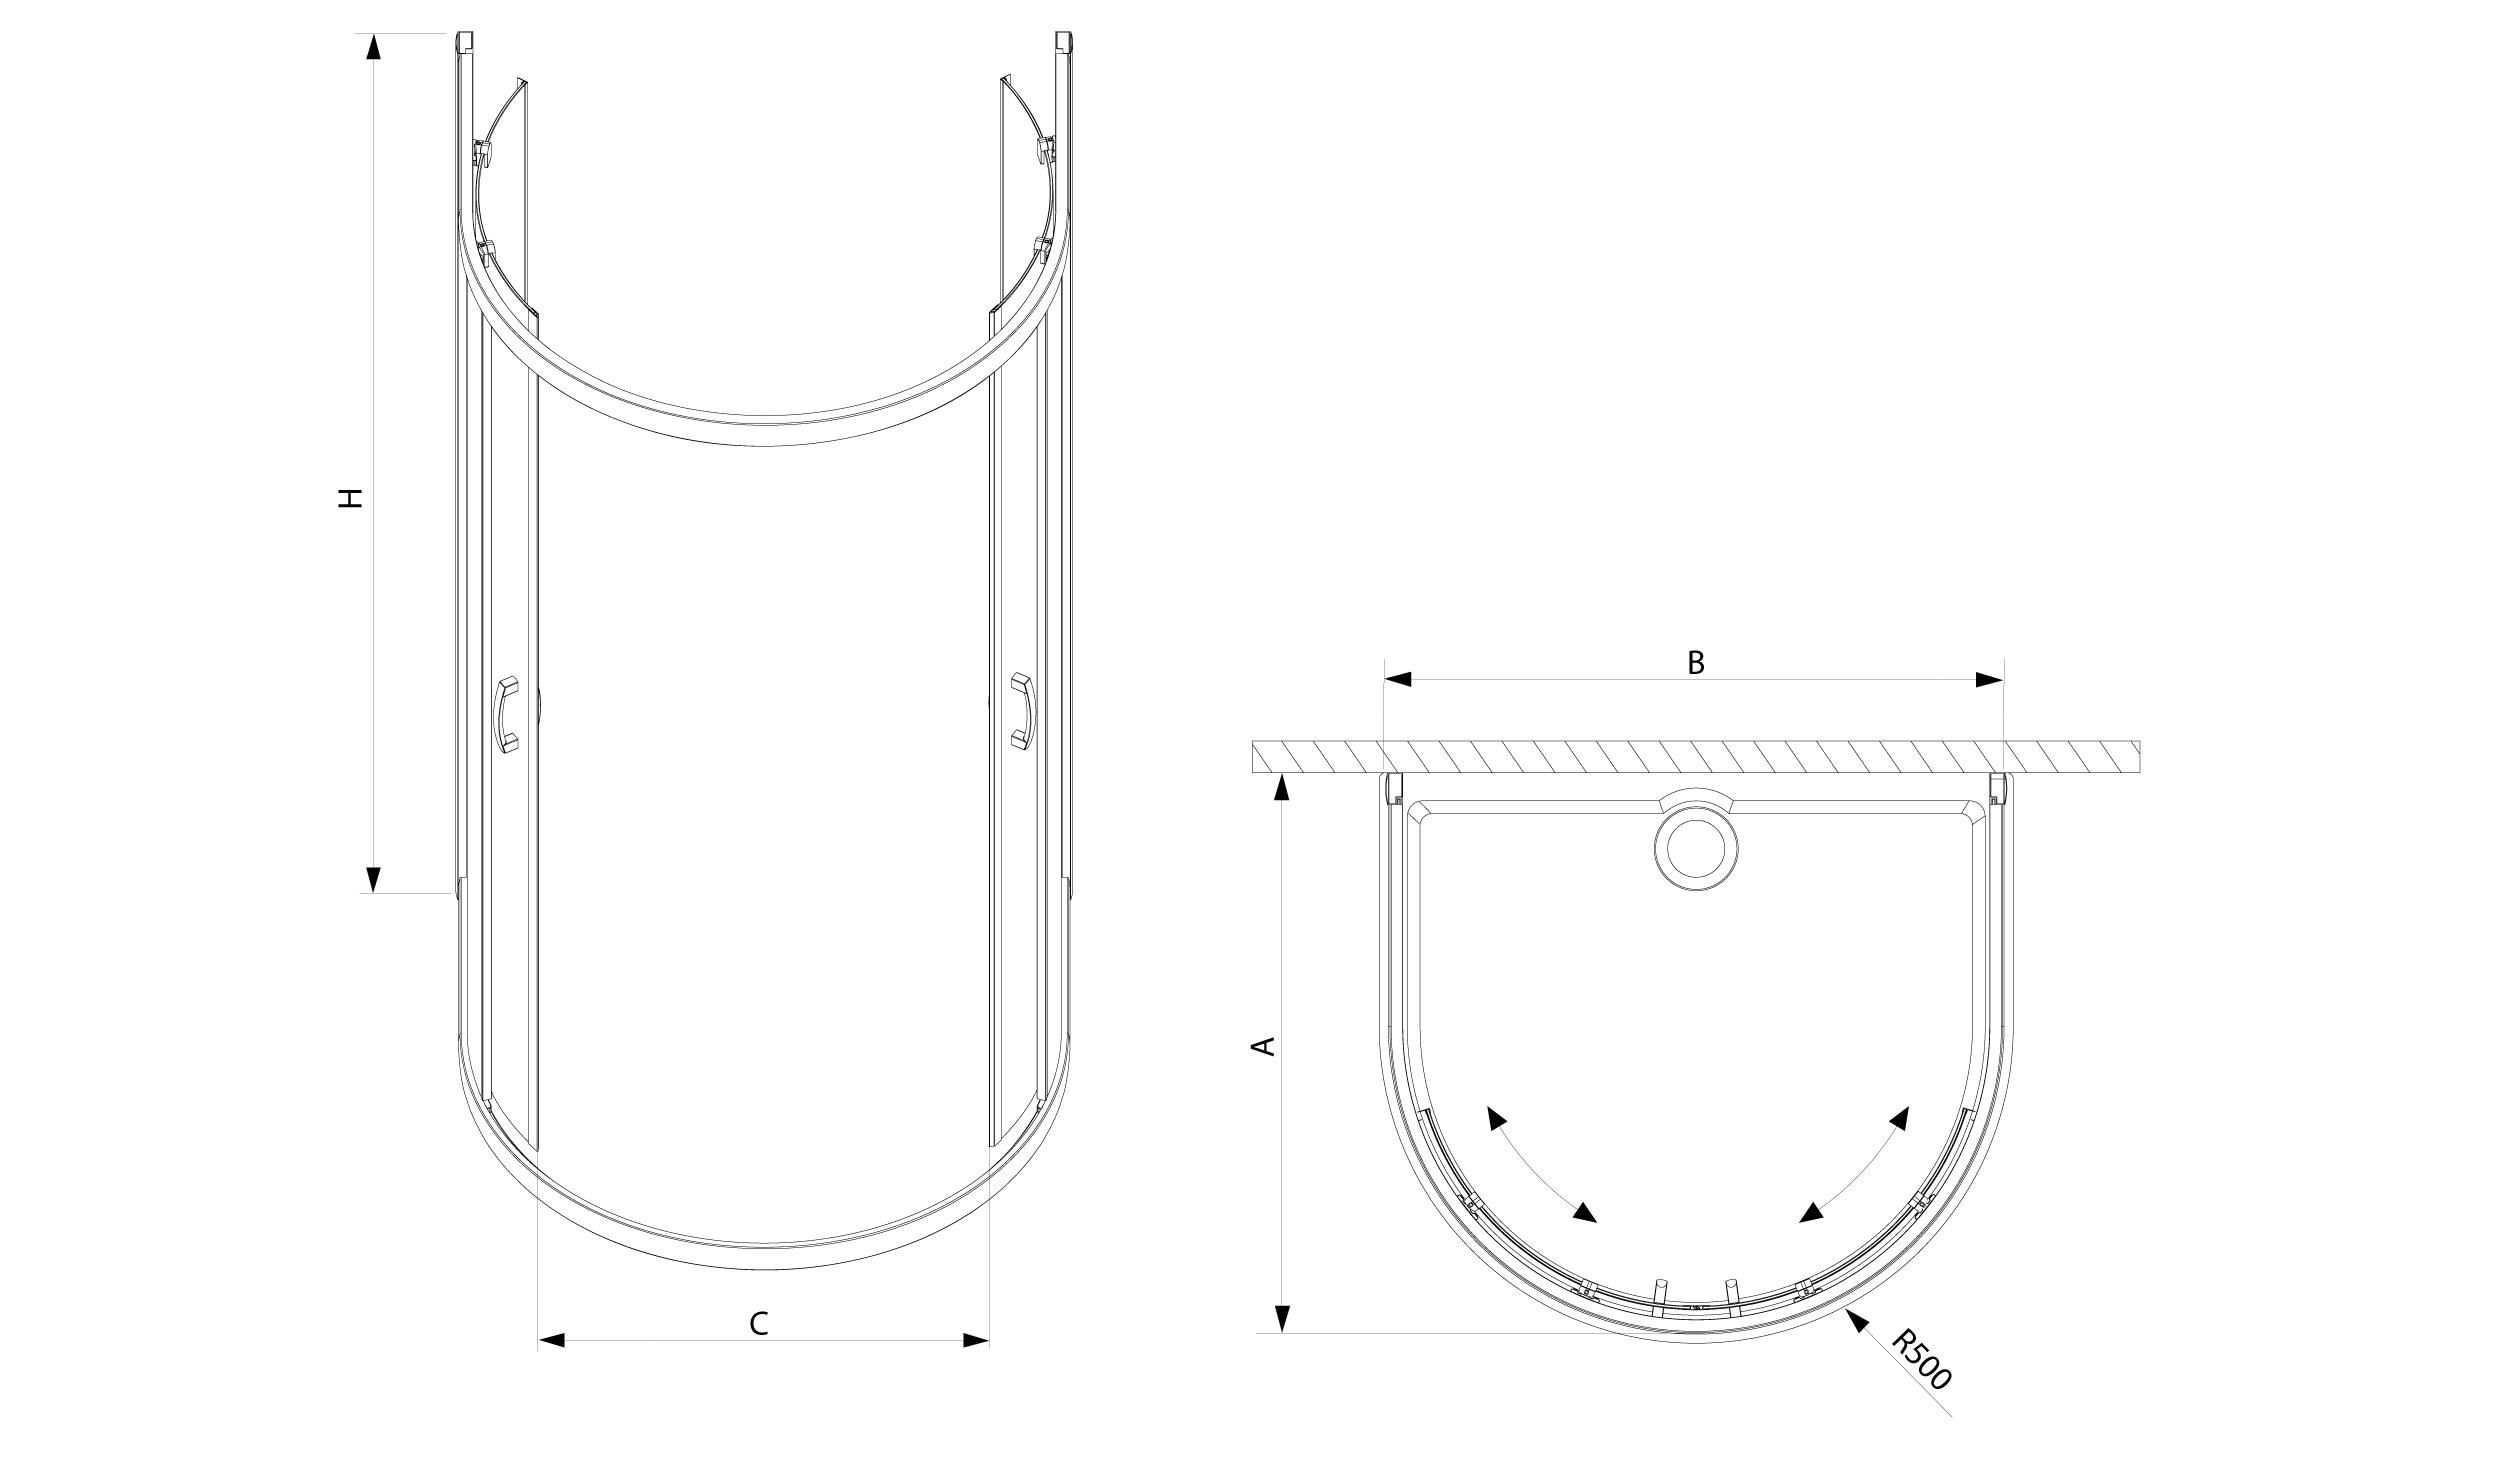 Radaway Premium Plus P falsíkra szerelhető görgős zuhanykabin